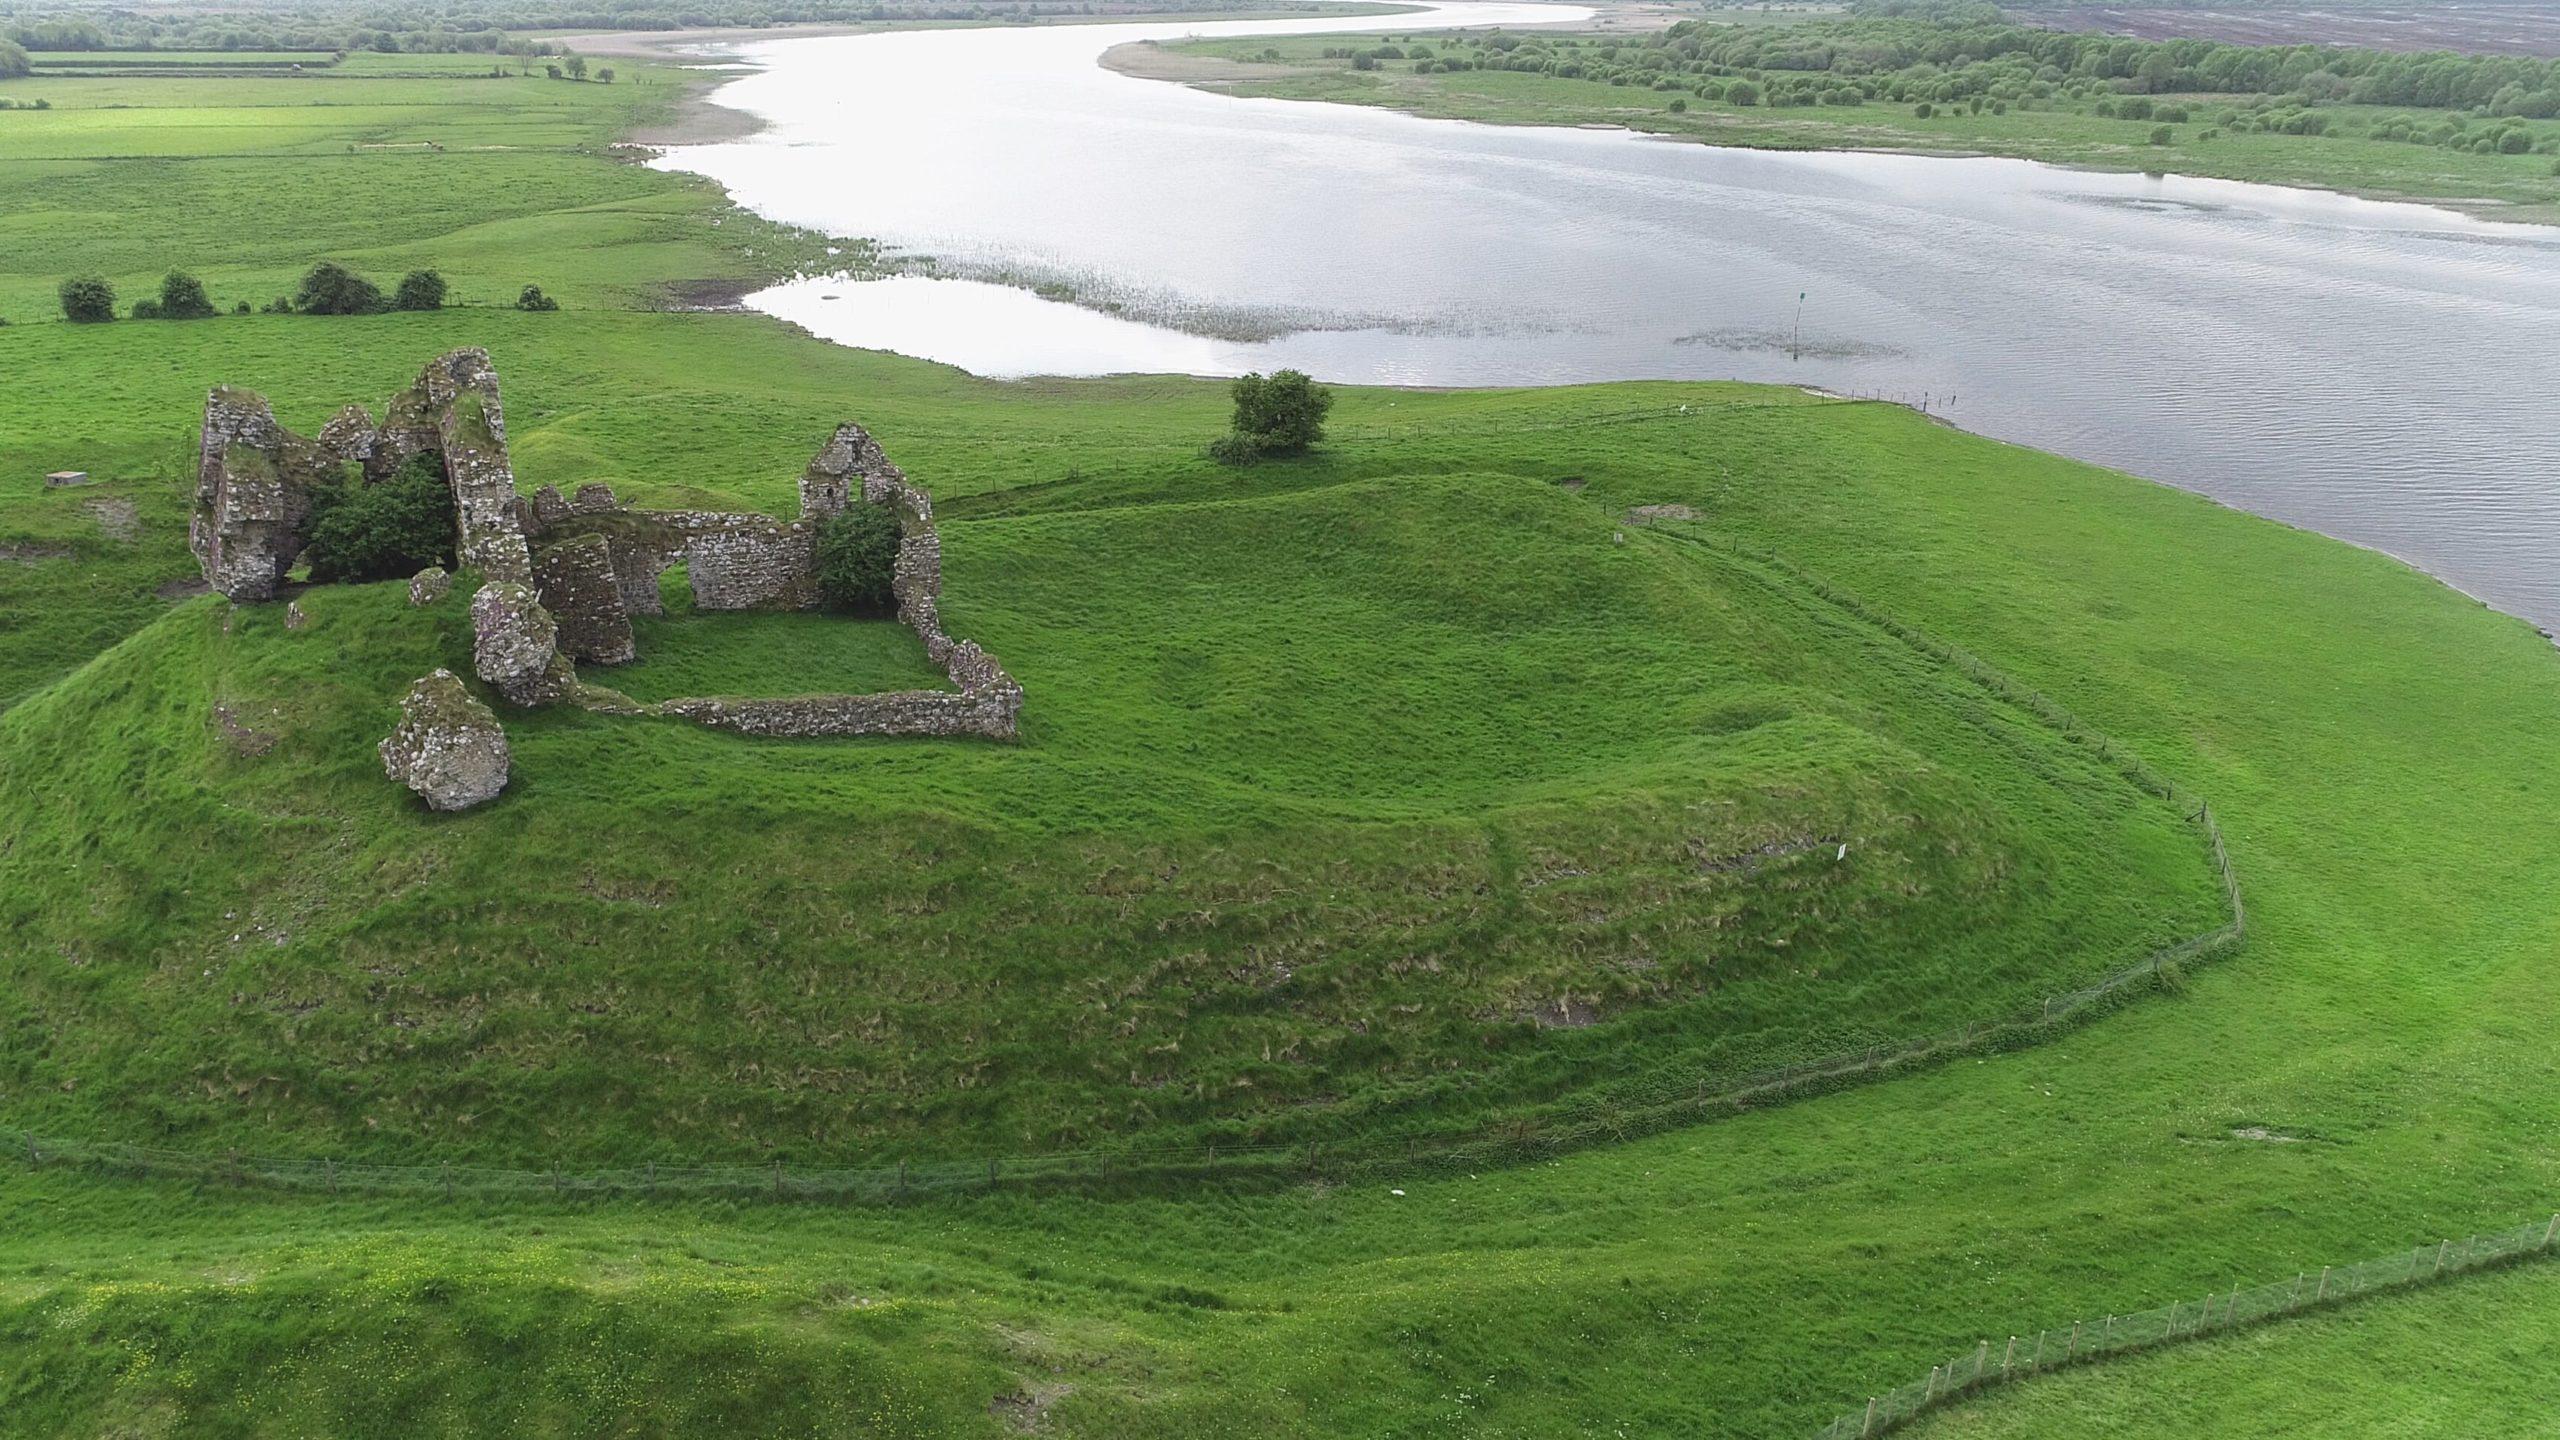 Landscape Aerial Photo Offaly, Ireland